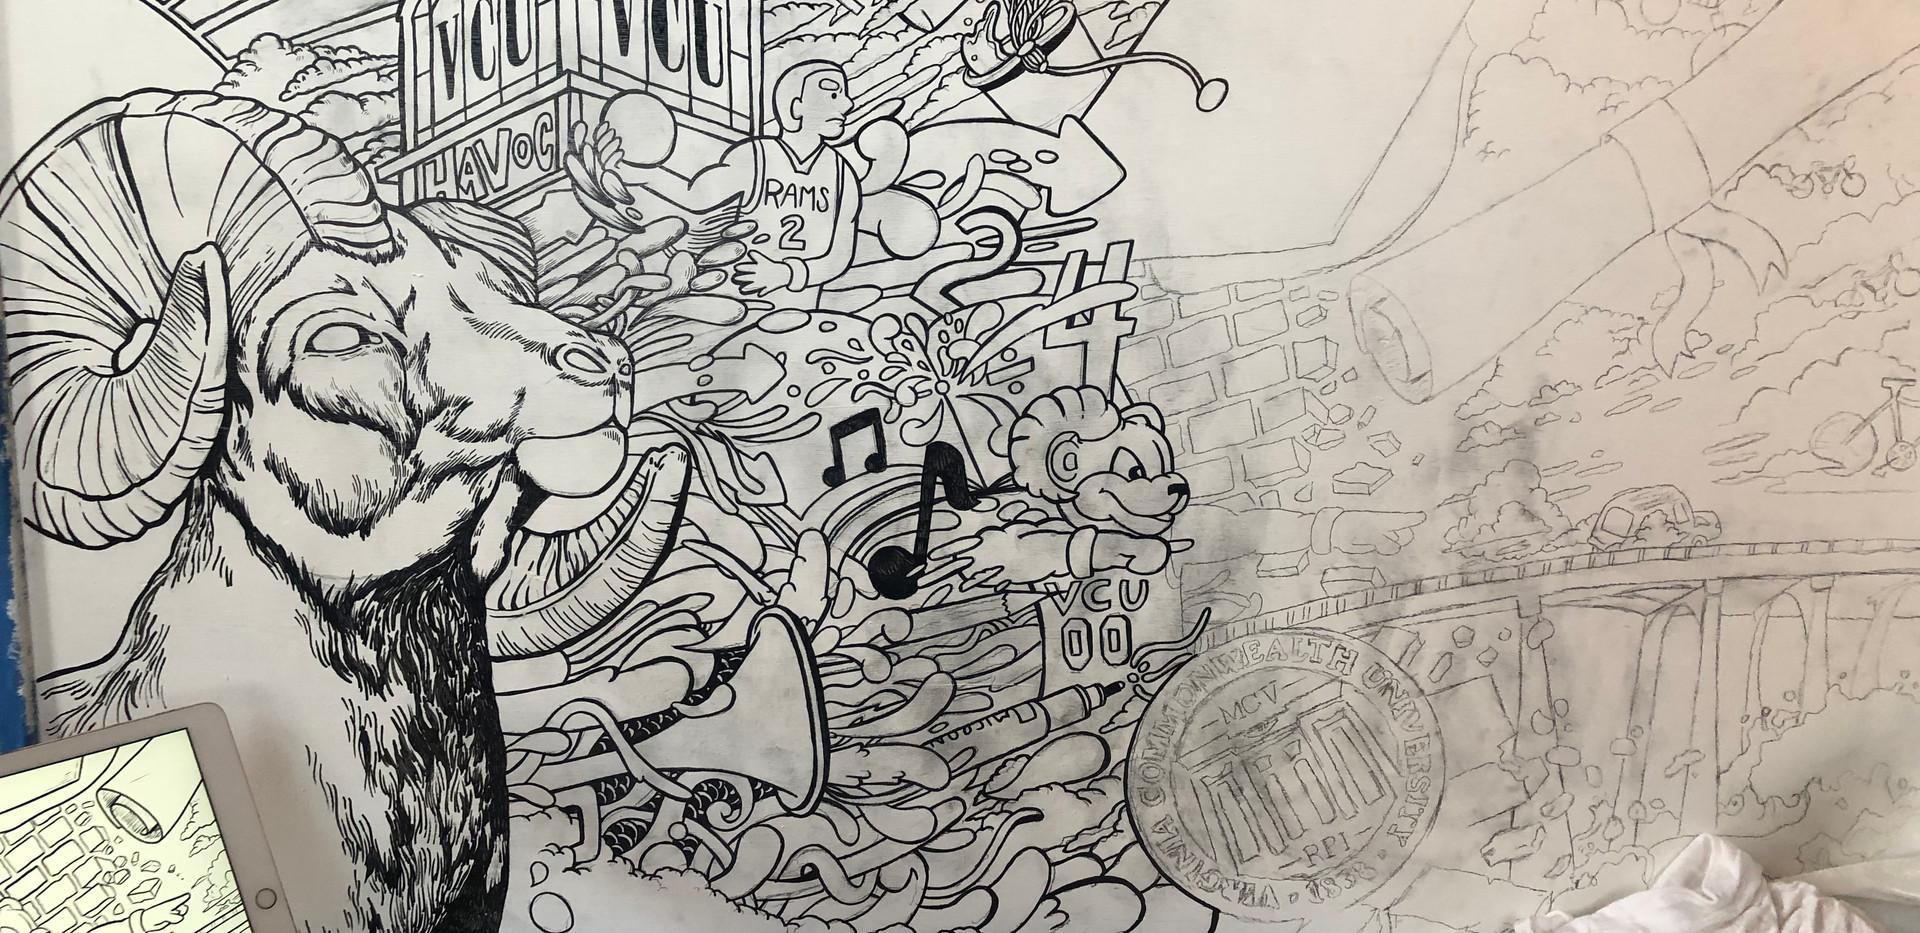 Inking Process